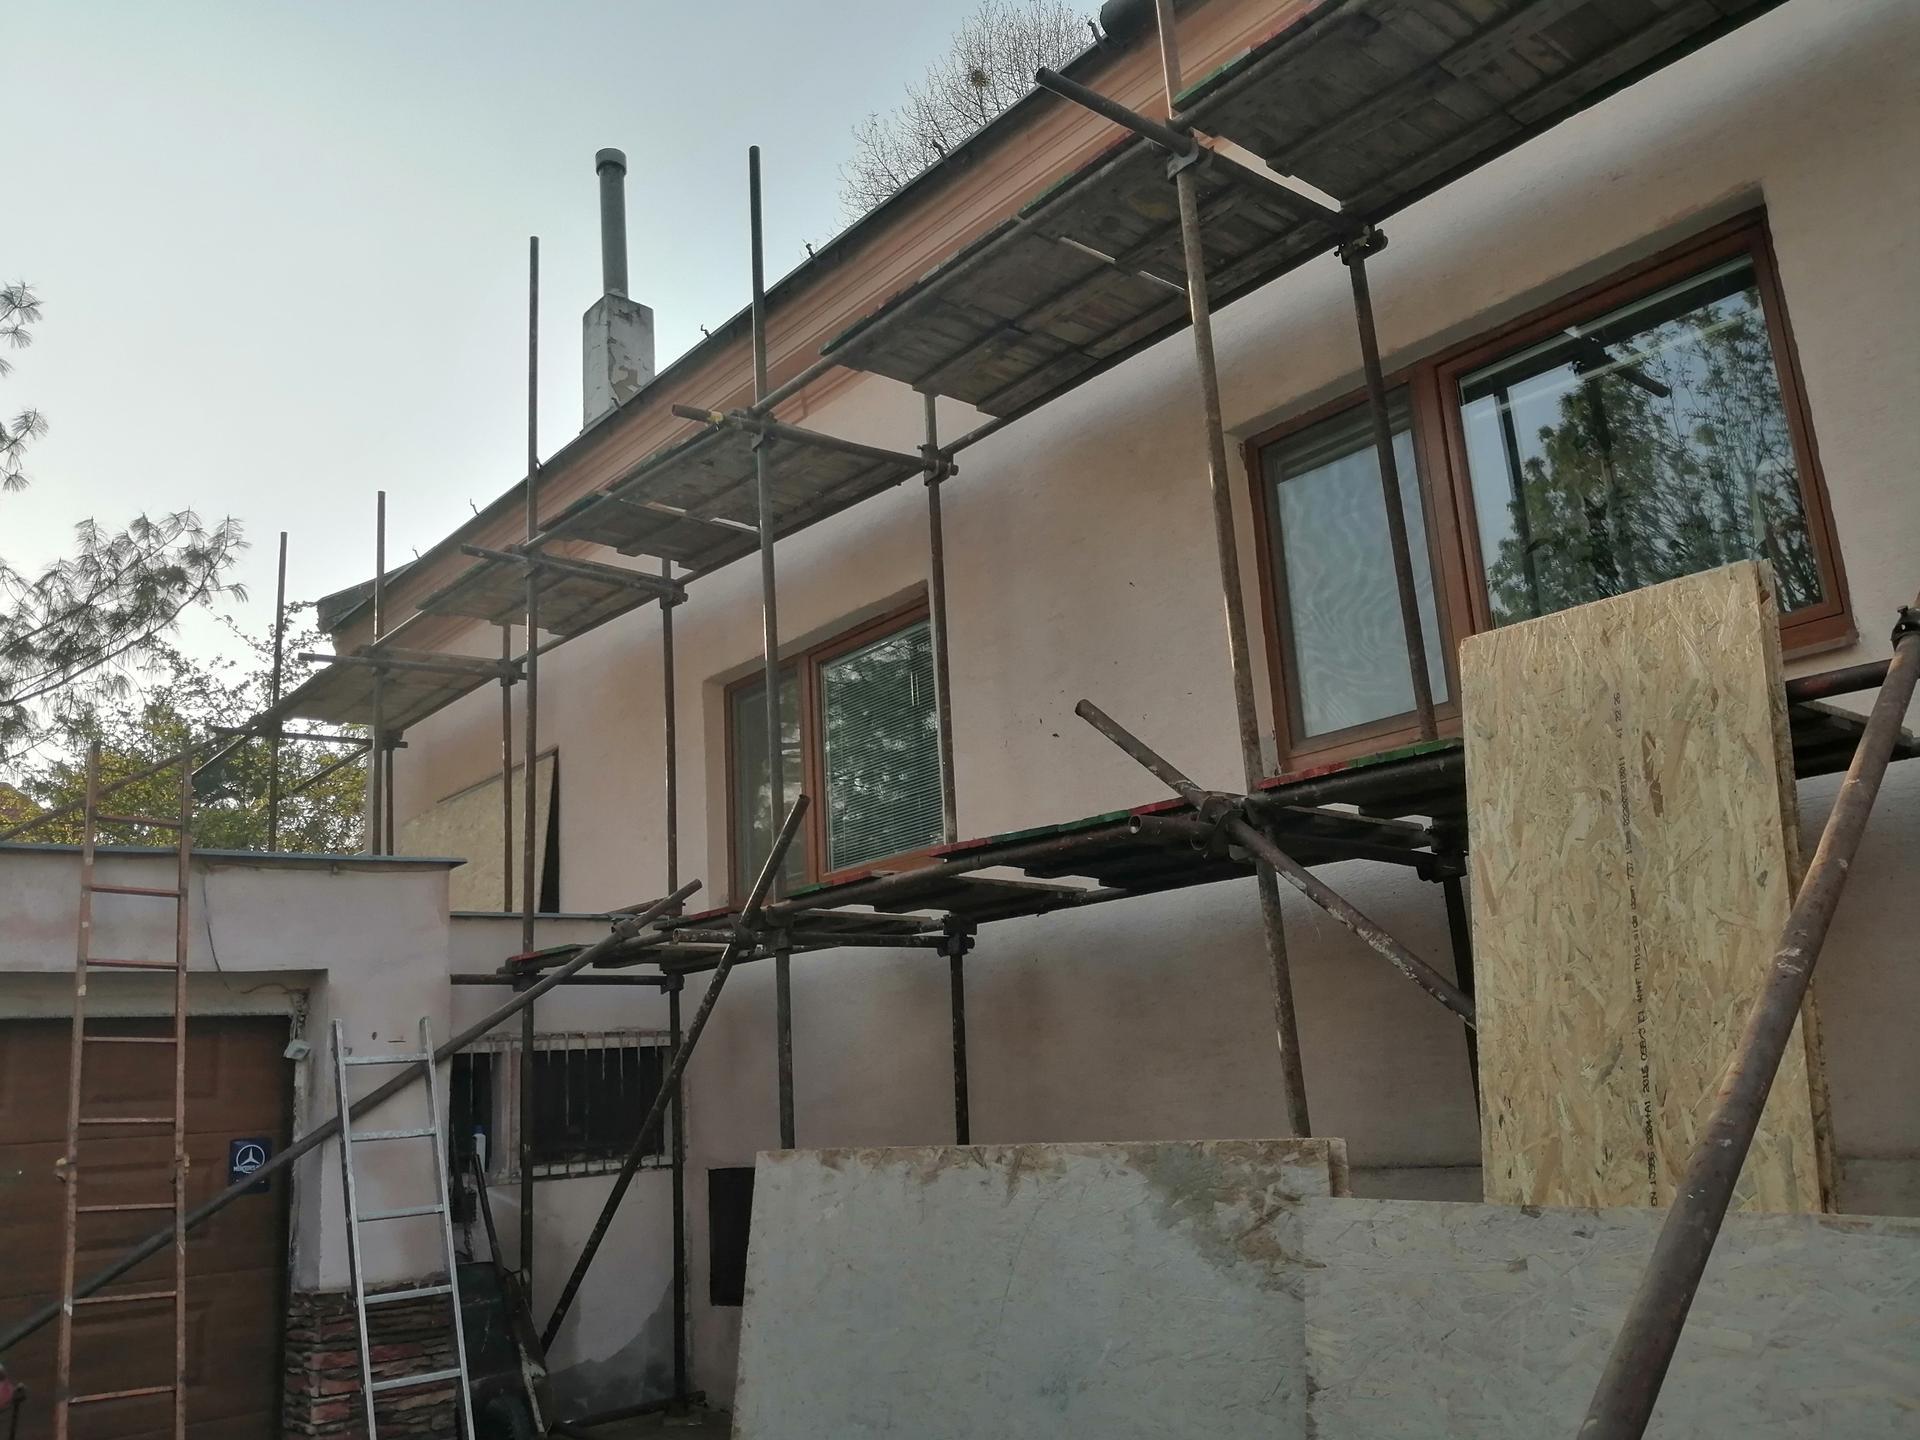 Prestavba podkrovia zo sedlovo valbovej na sedlovú strechu. - Obrázok č. 18